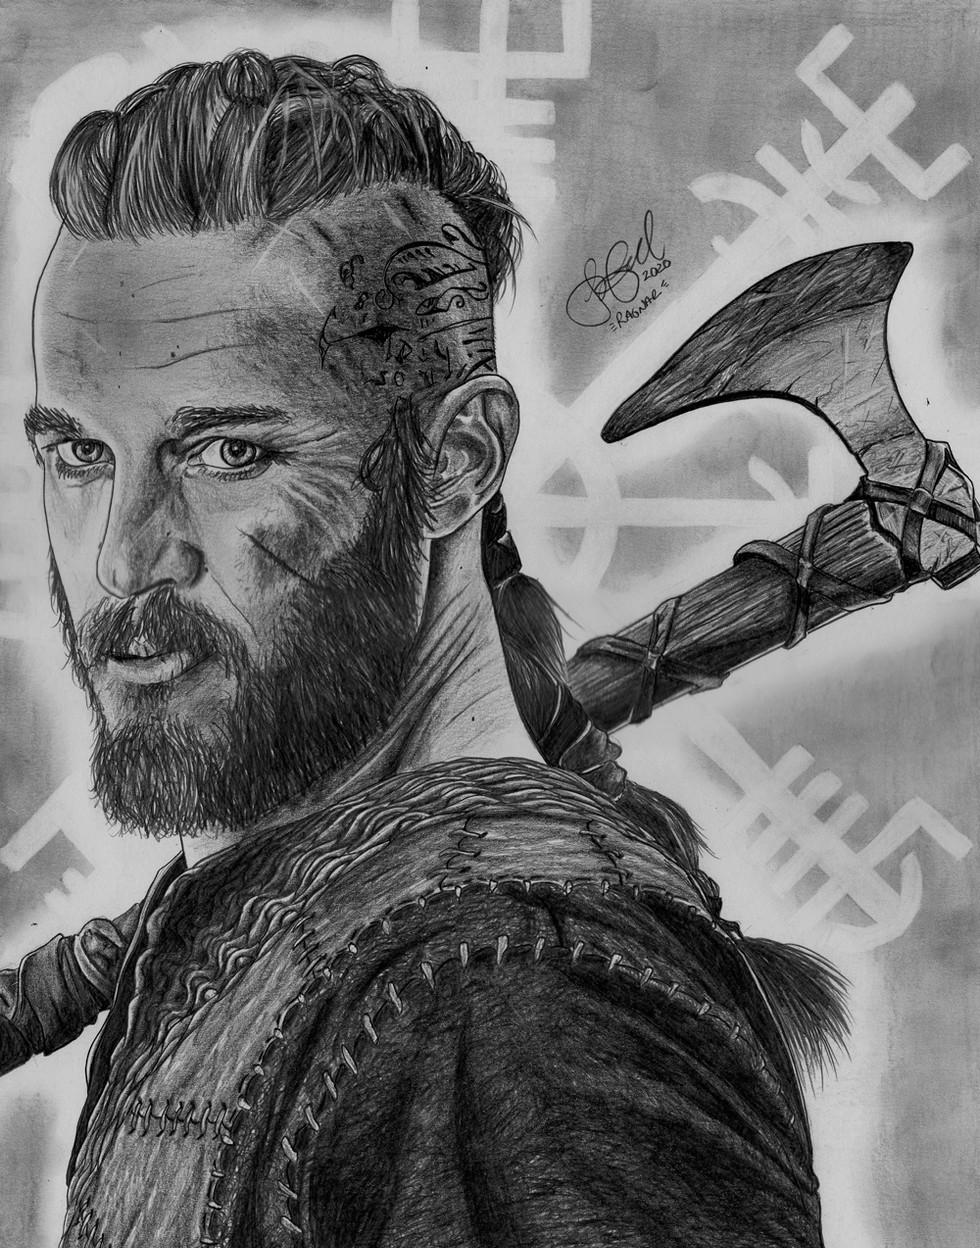 Travis Fimmel (Ragnar Lothbrok)